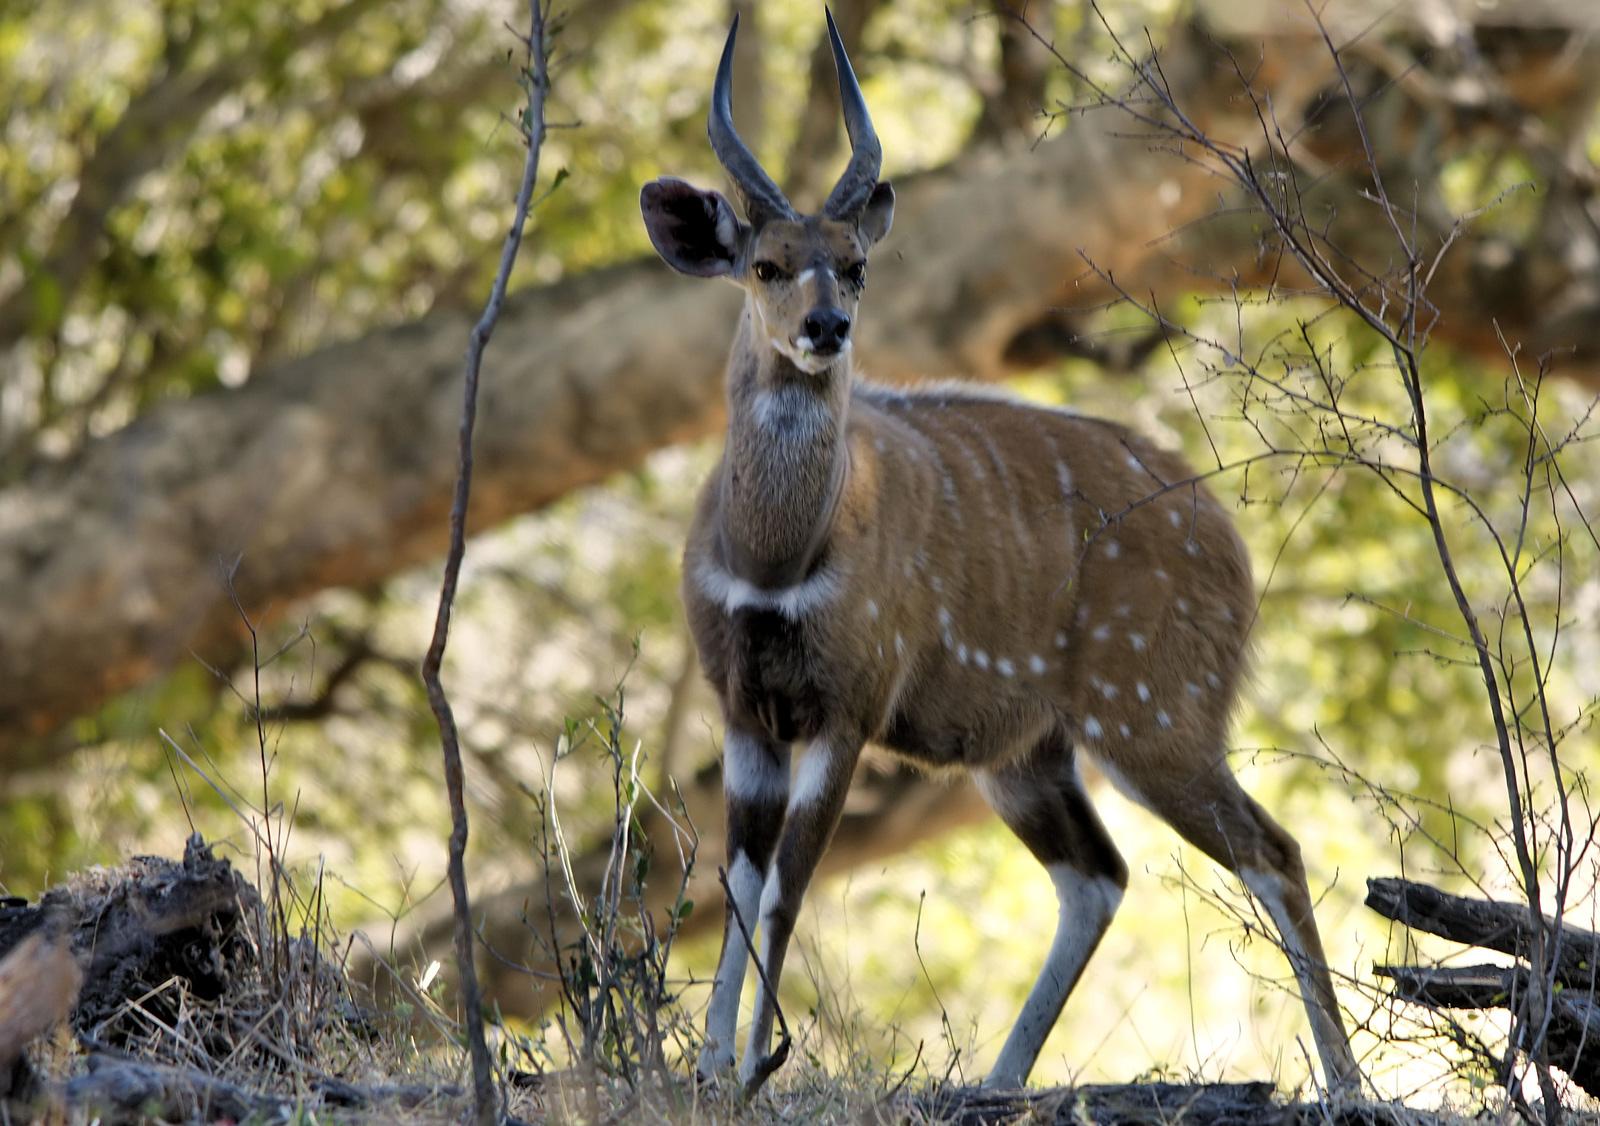 Bushbuck. Photo credit: Hans Hillewaert. https://commons.wikimedia.org/wiki/File:Tragelaphus_scriptus_(male).jpg